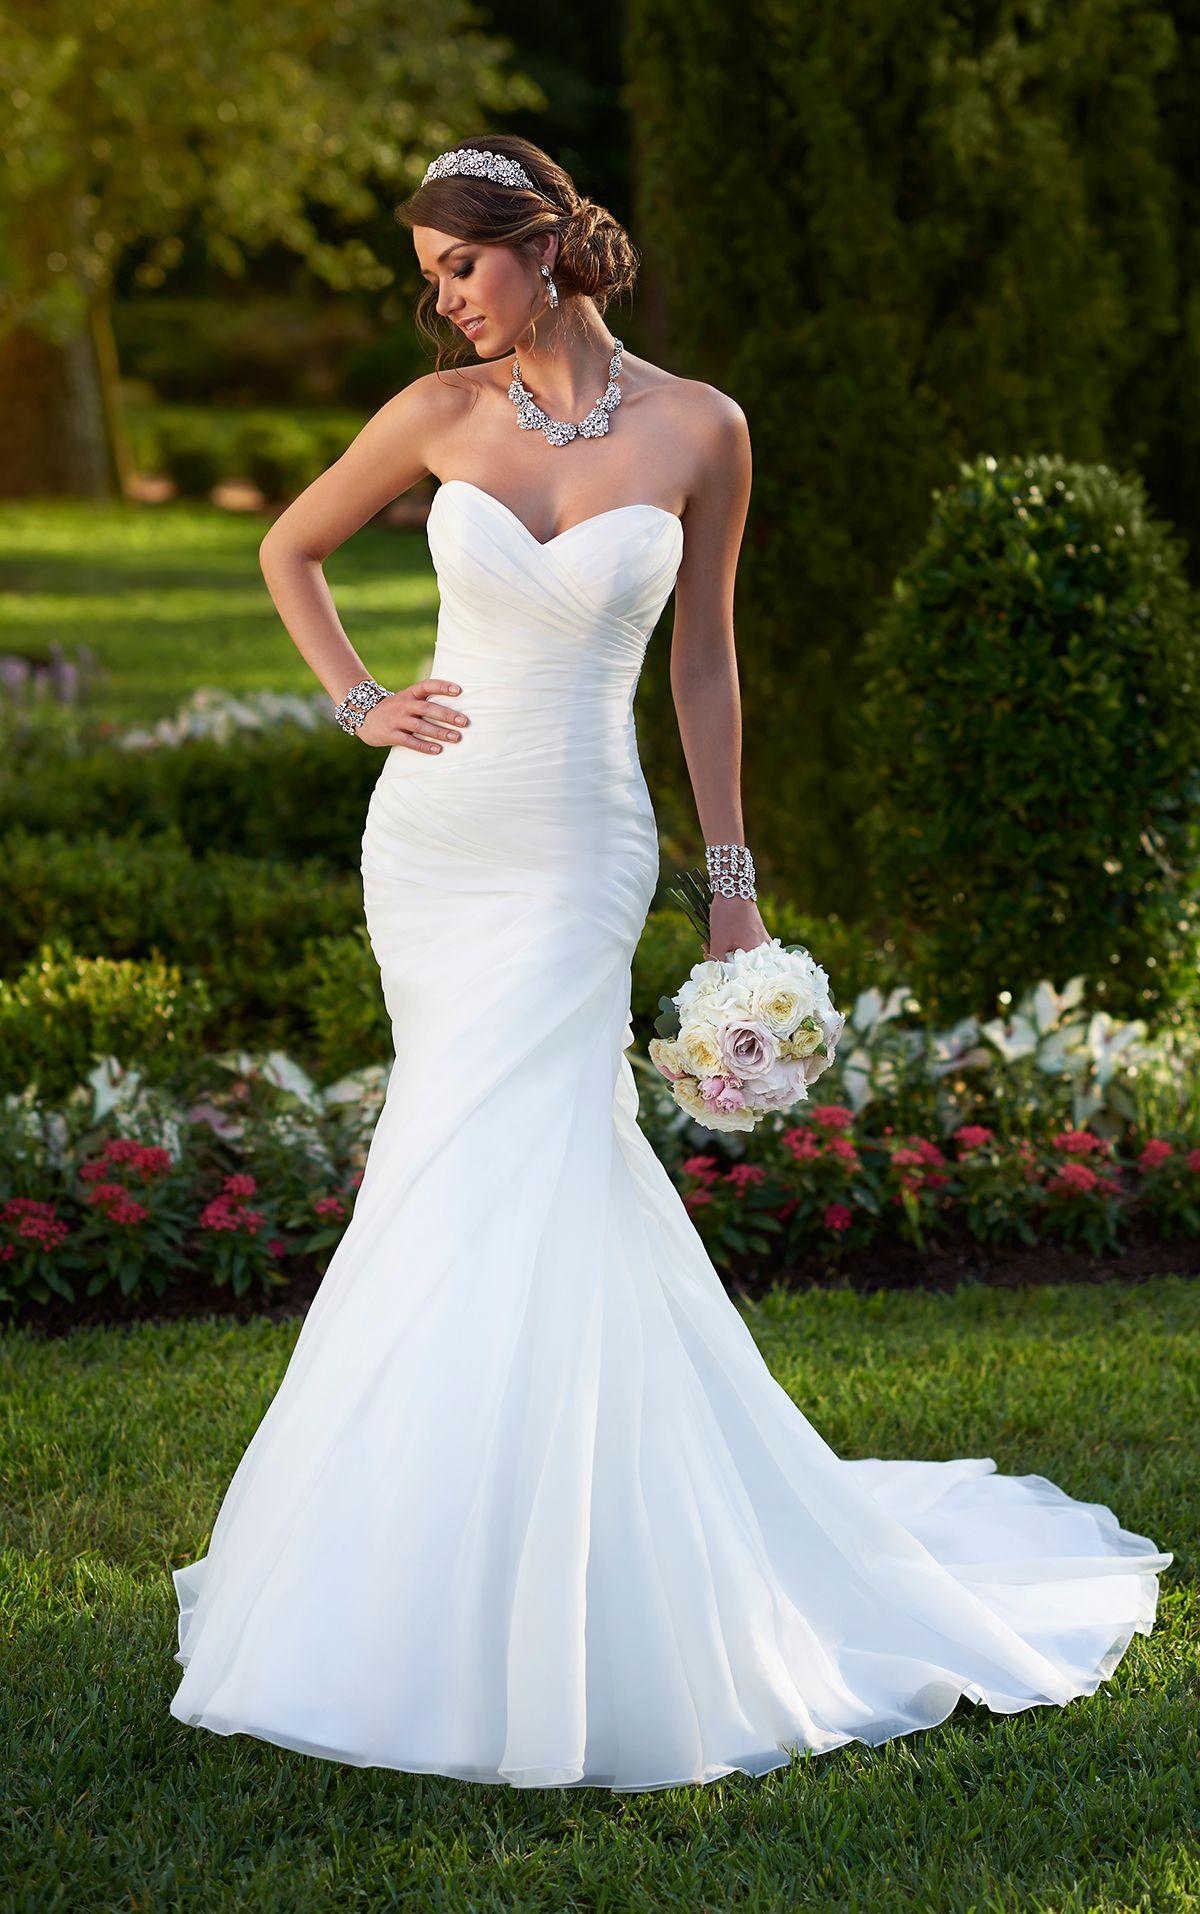 Medium Of Corset Wedding Dresses